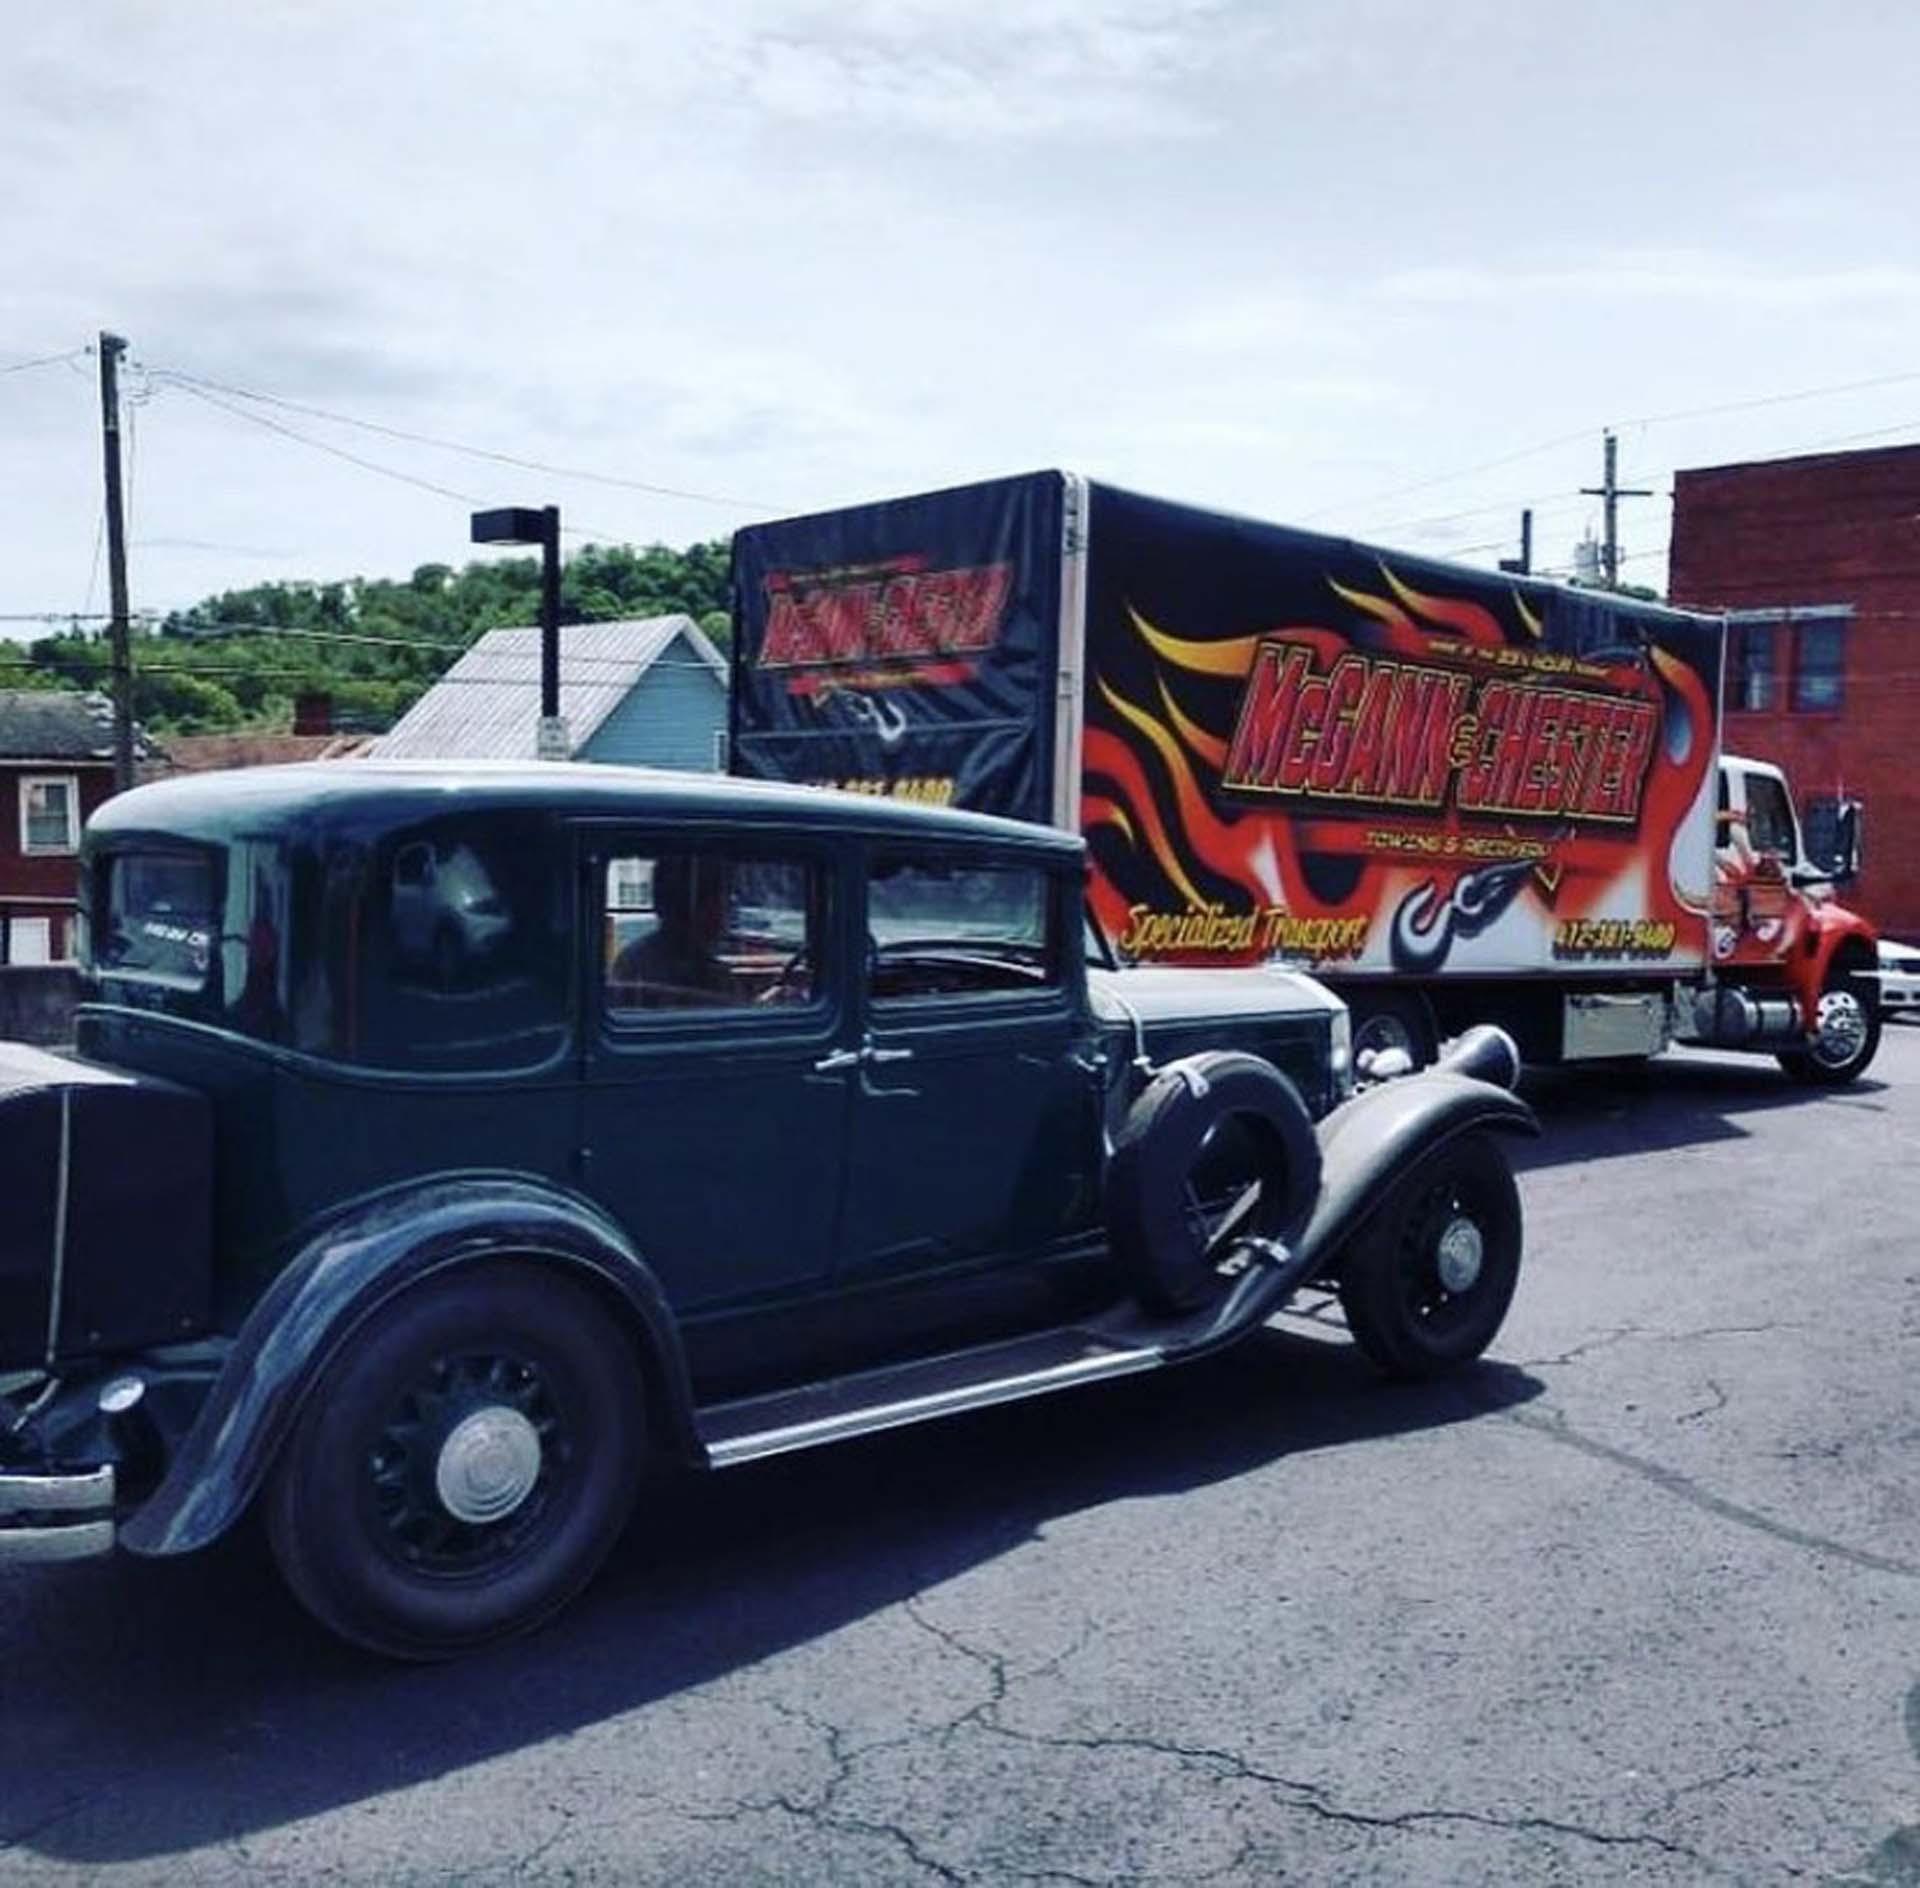 McGann & Chester truck & old car